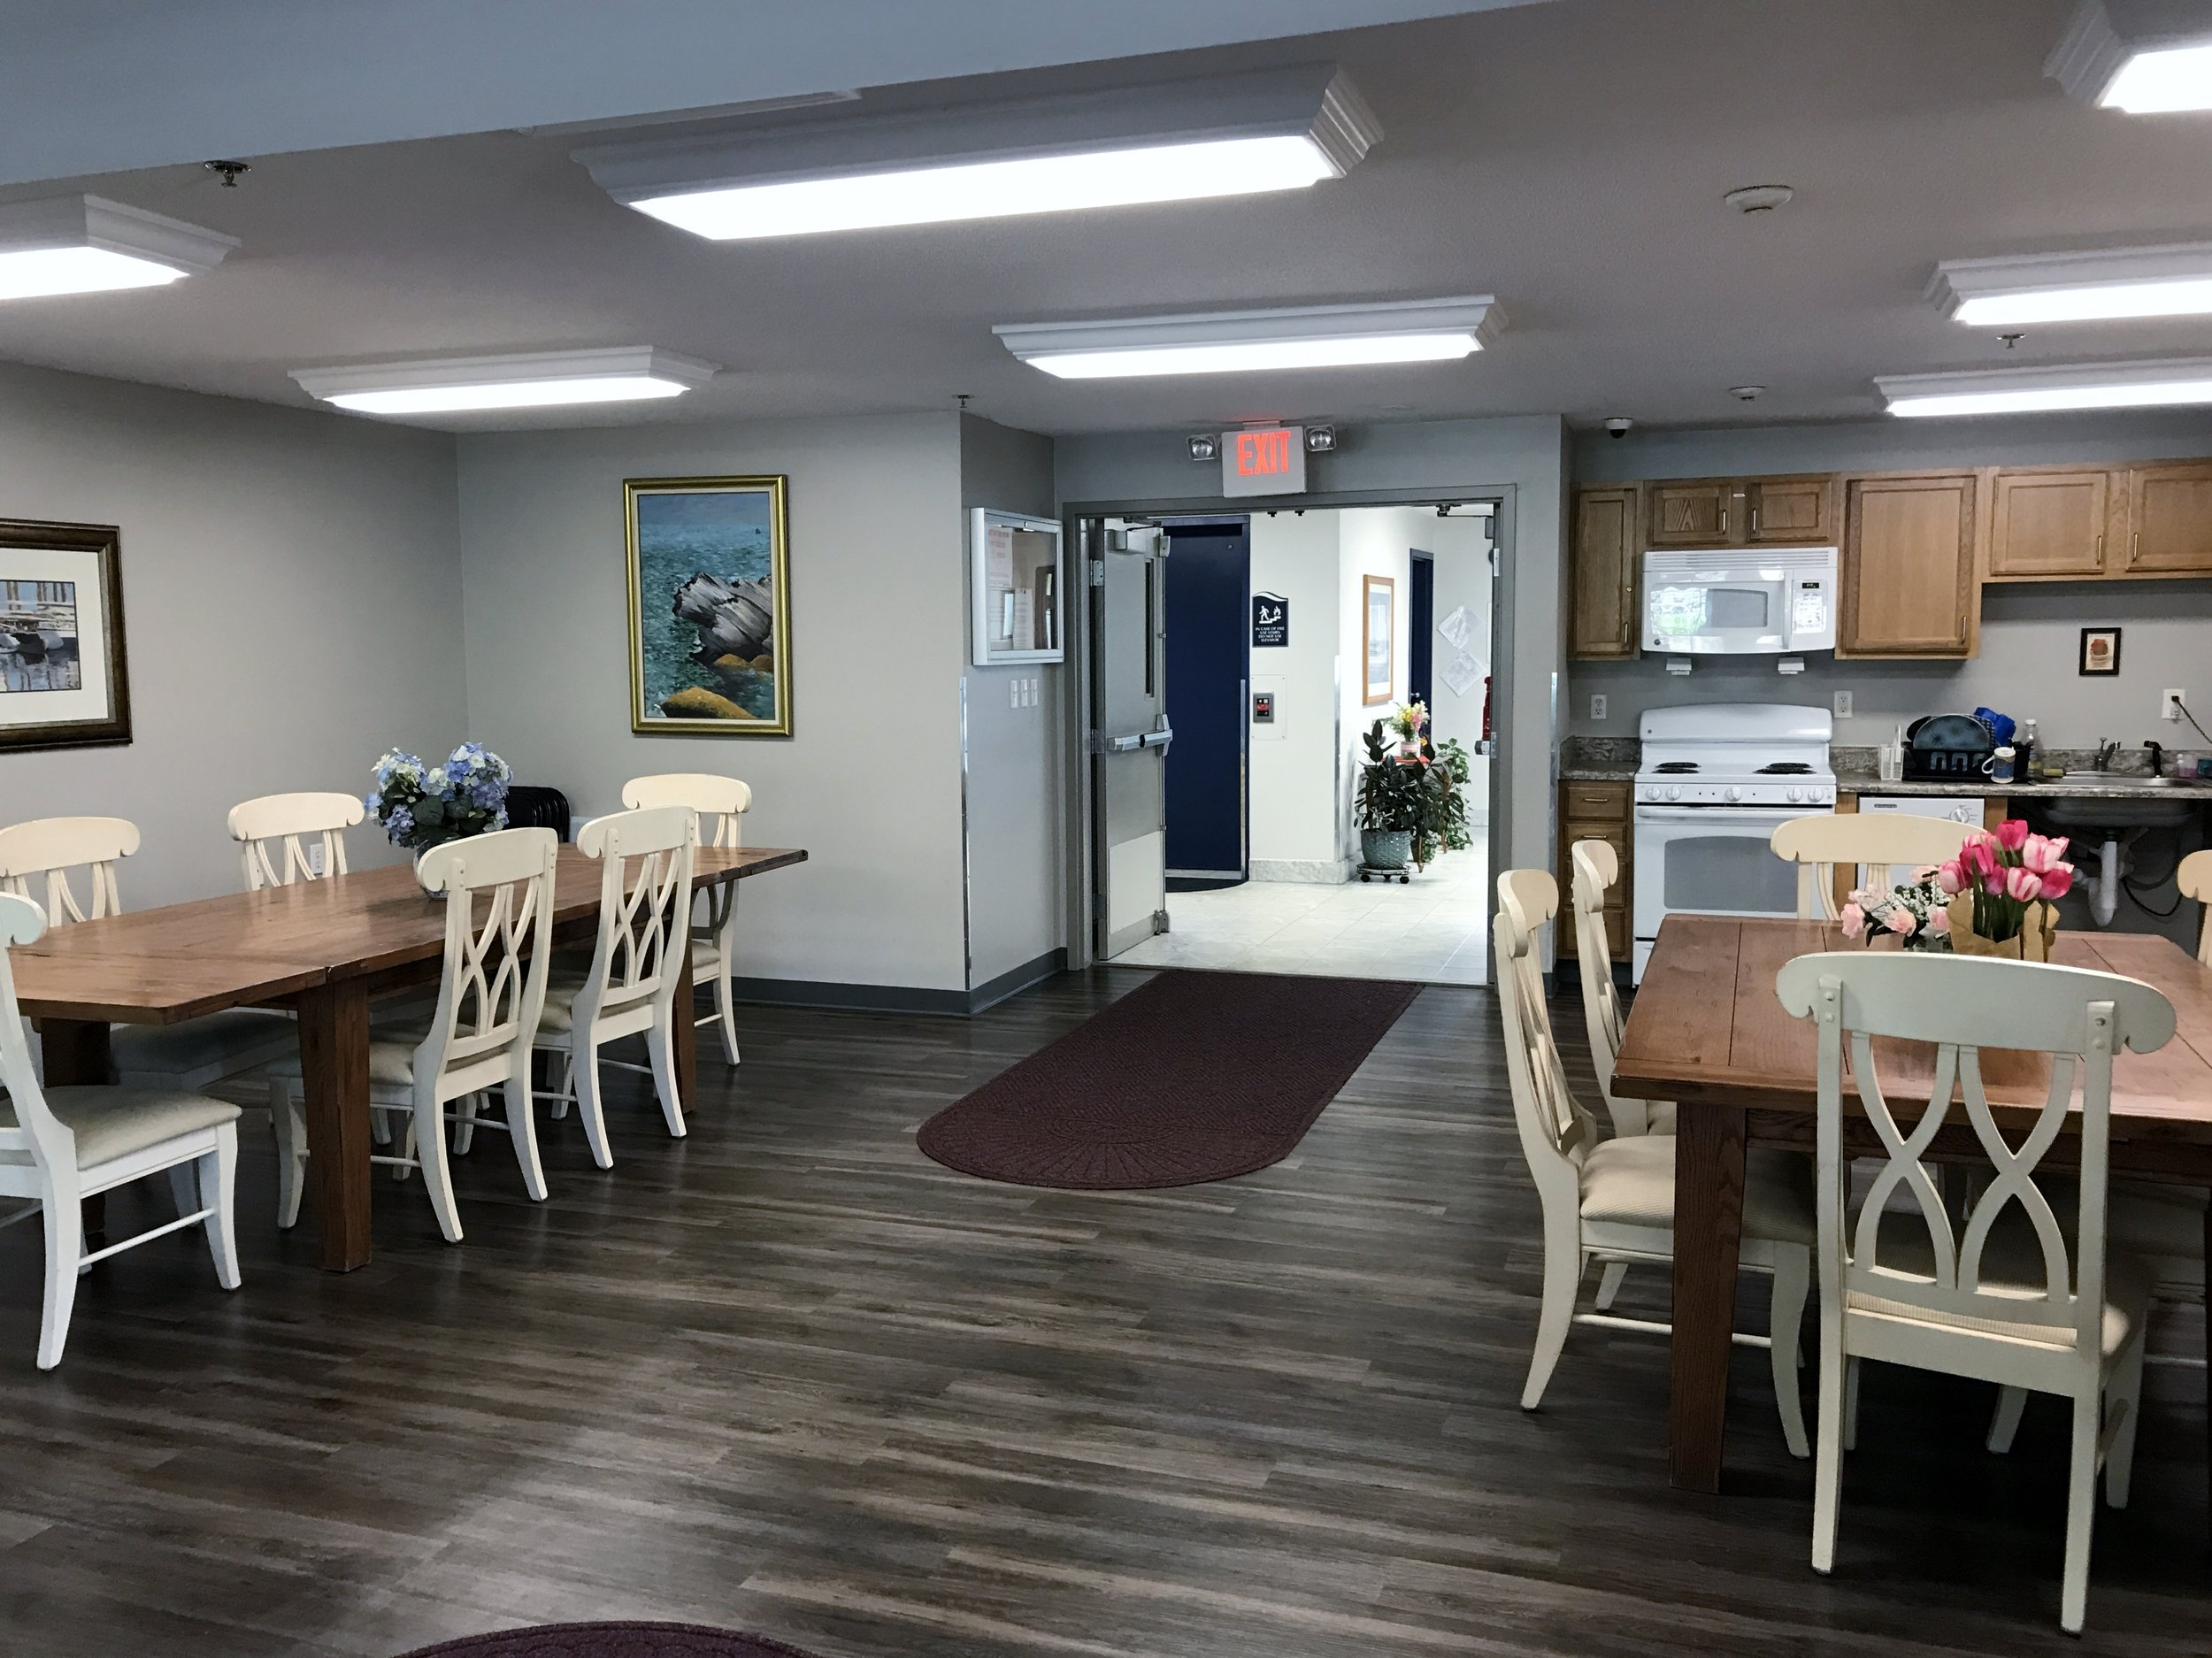 6-Community Room 2.JPG